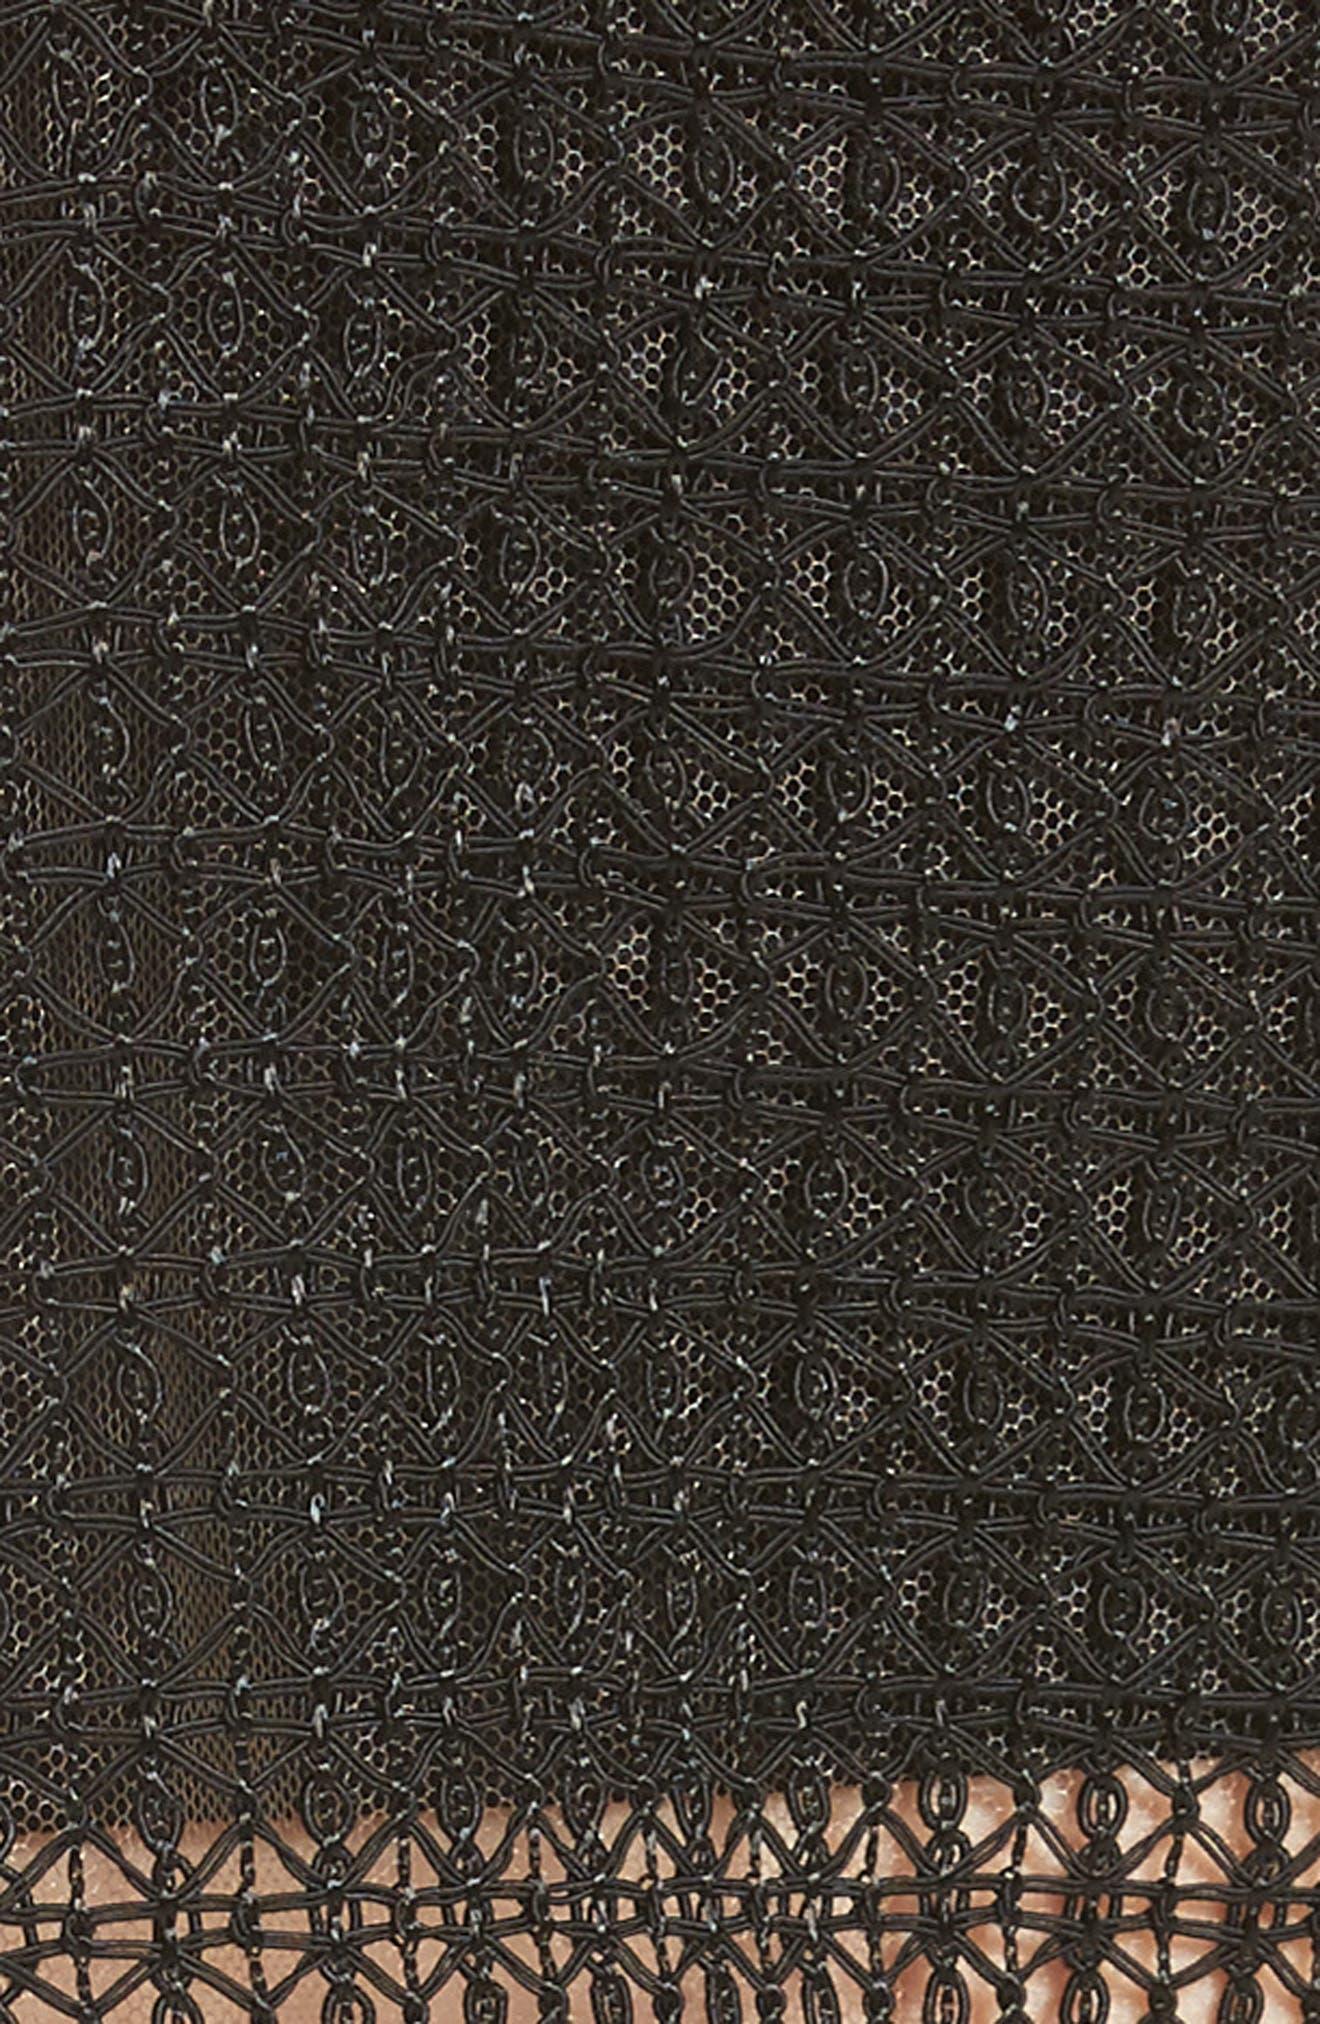 Geometric Lace Top,                             Alternate thumbnail 3, color,                             Onyx